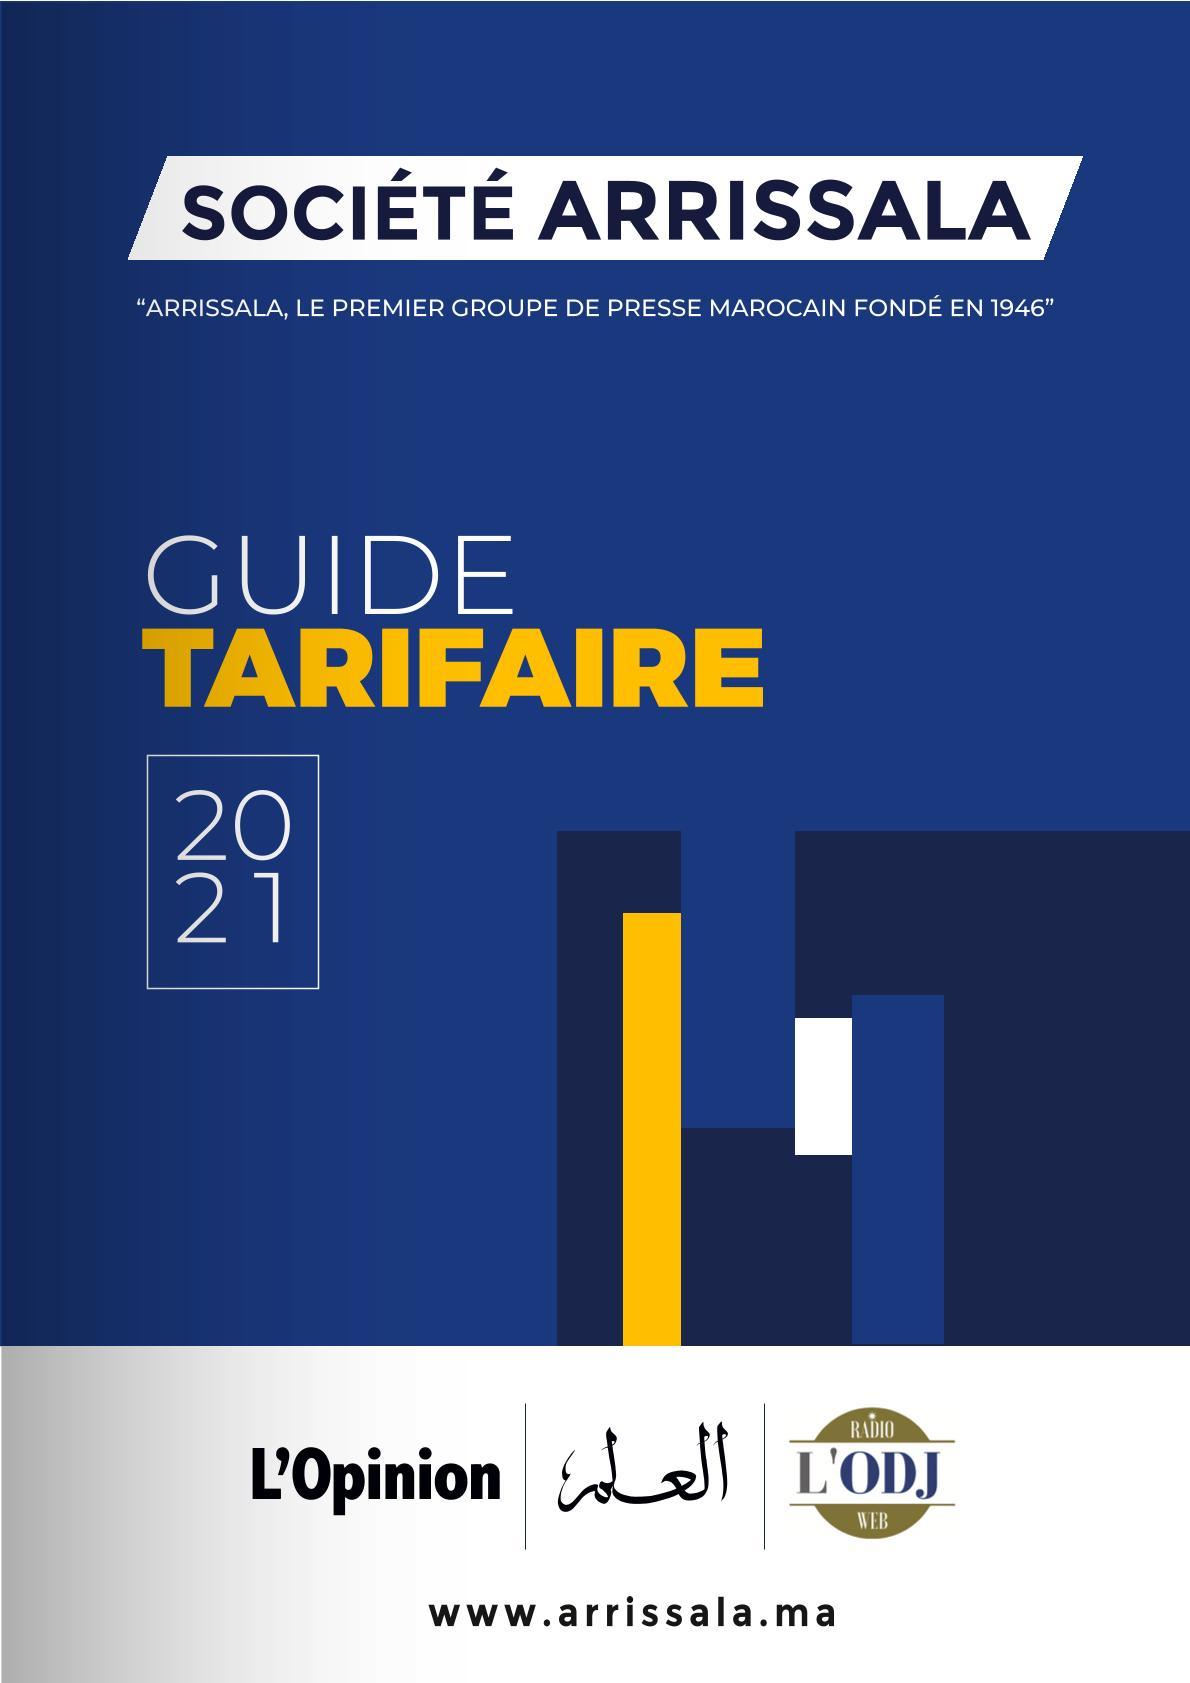 Brochure Grille Tarifaire Arrissala 2021